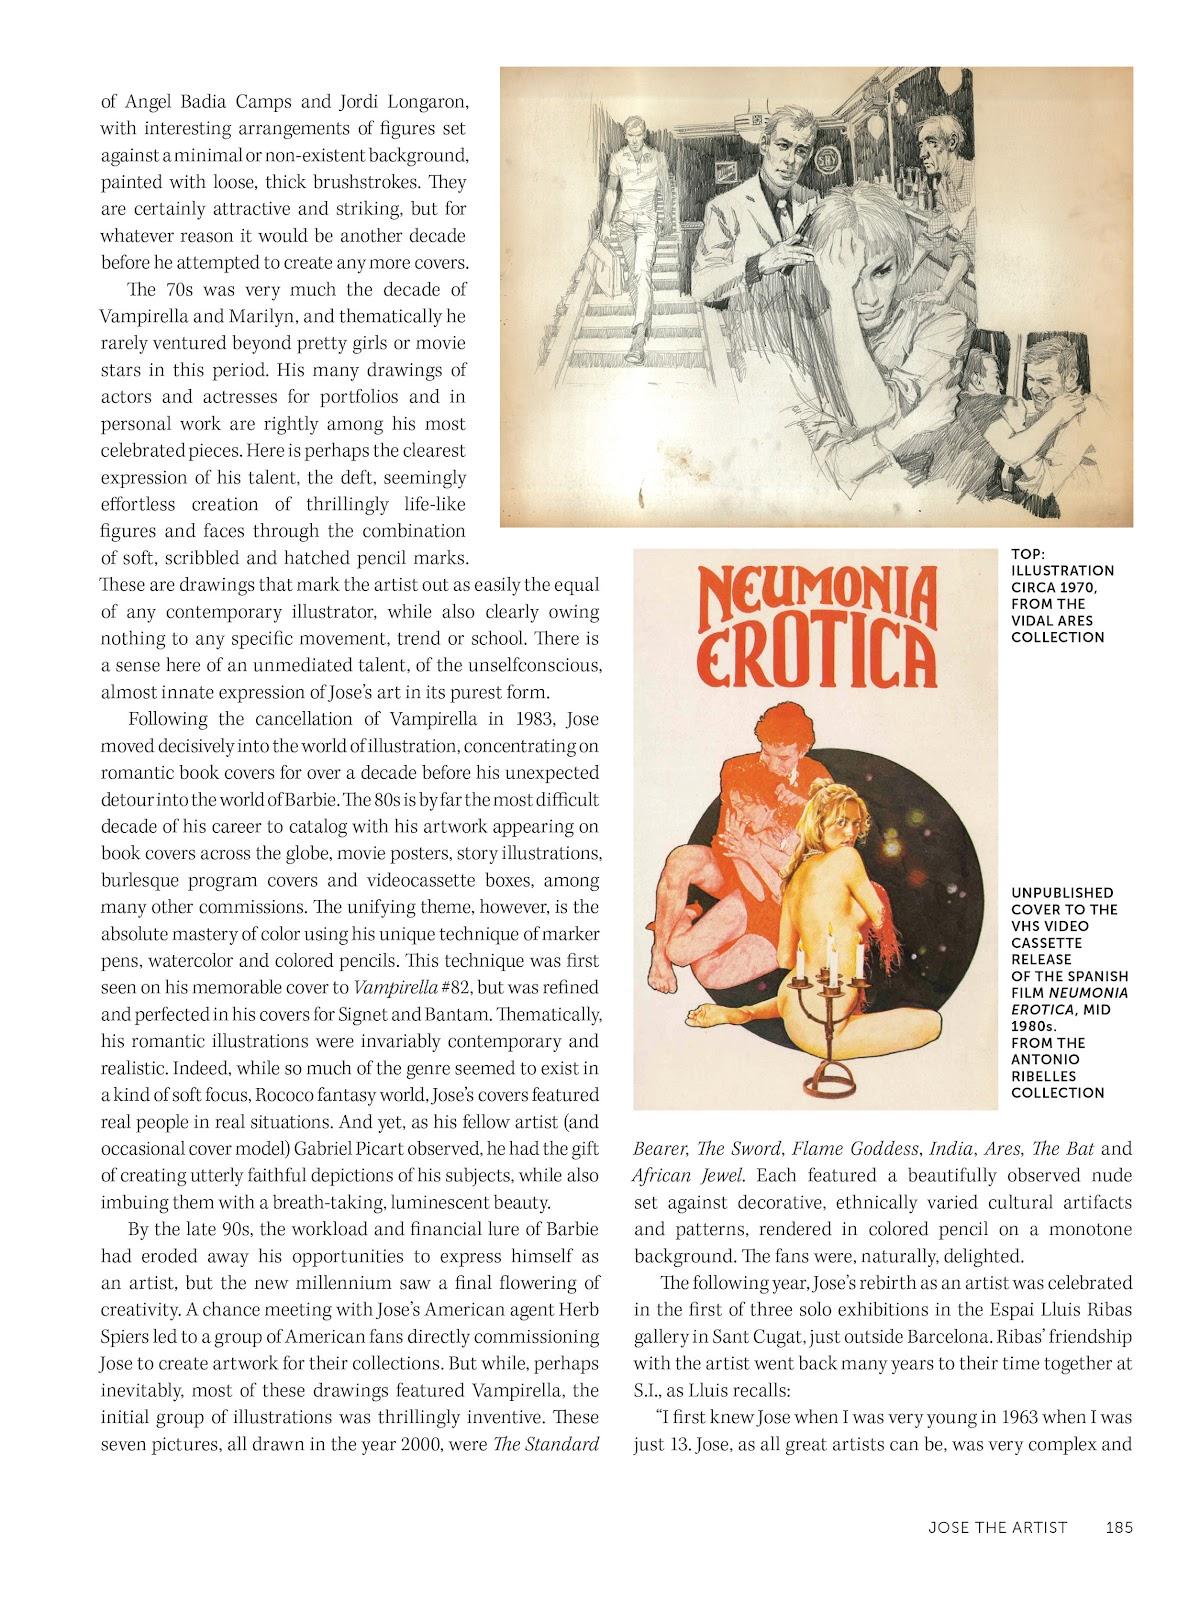 Read online The Art of Jose Gonzalez comic -  Issue # TPB (Part 2) - 87